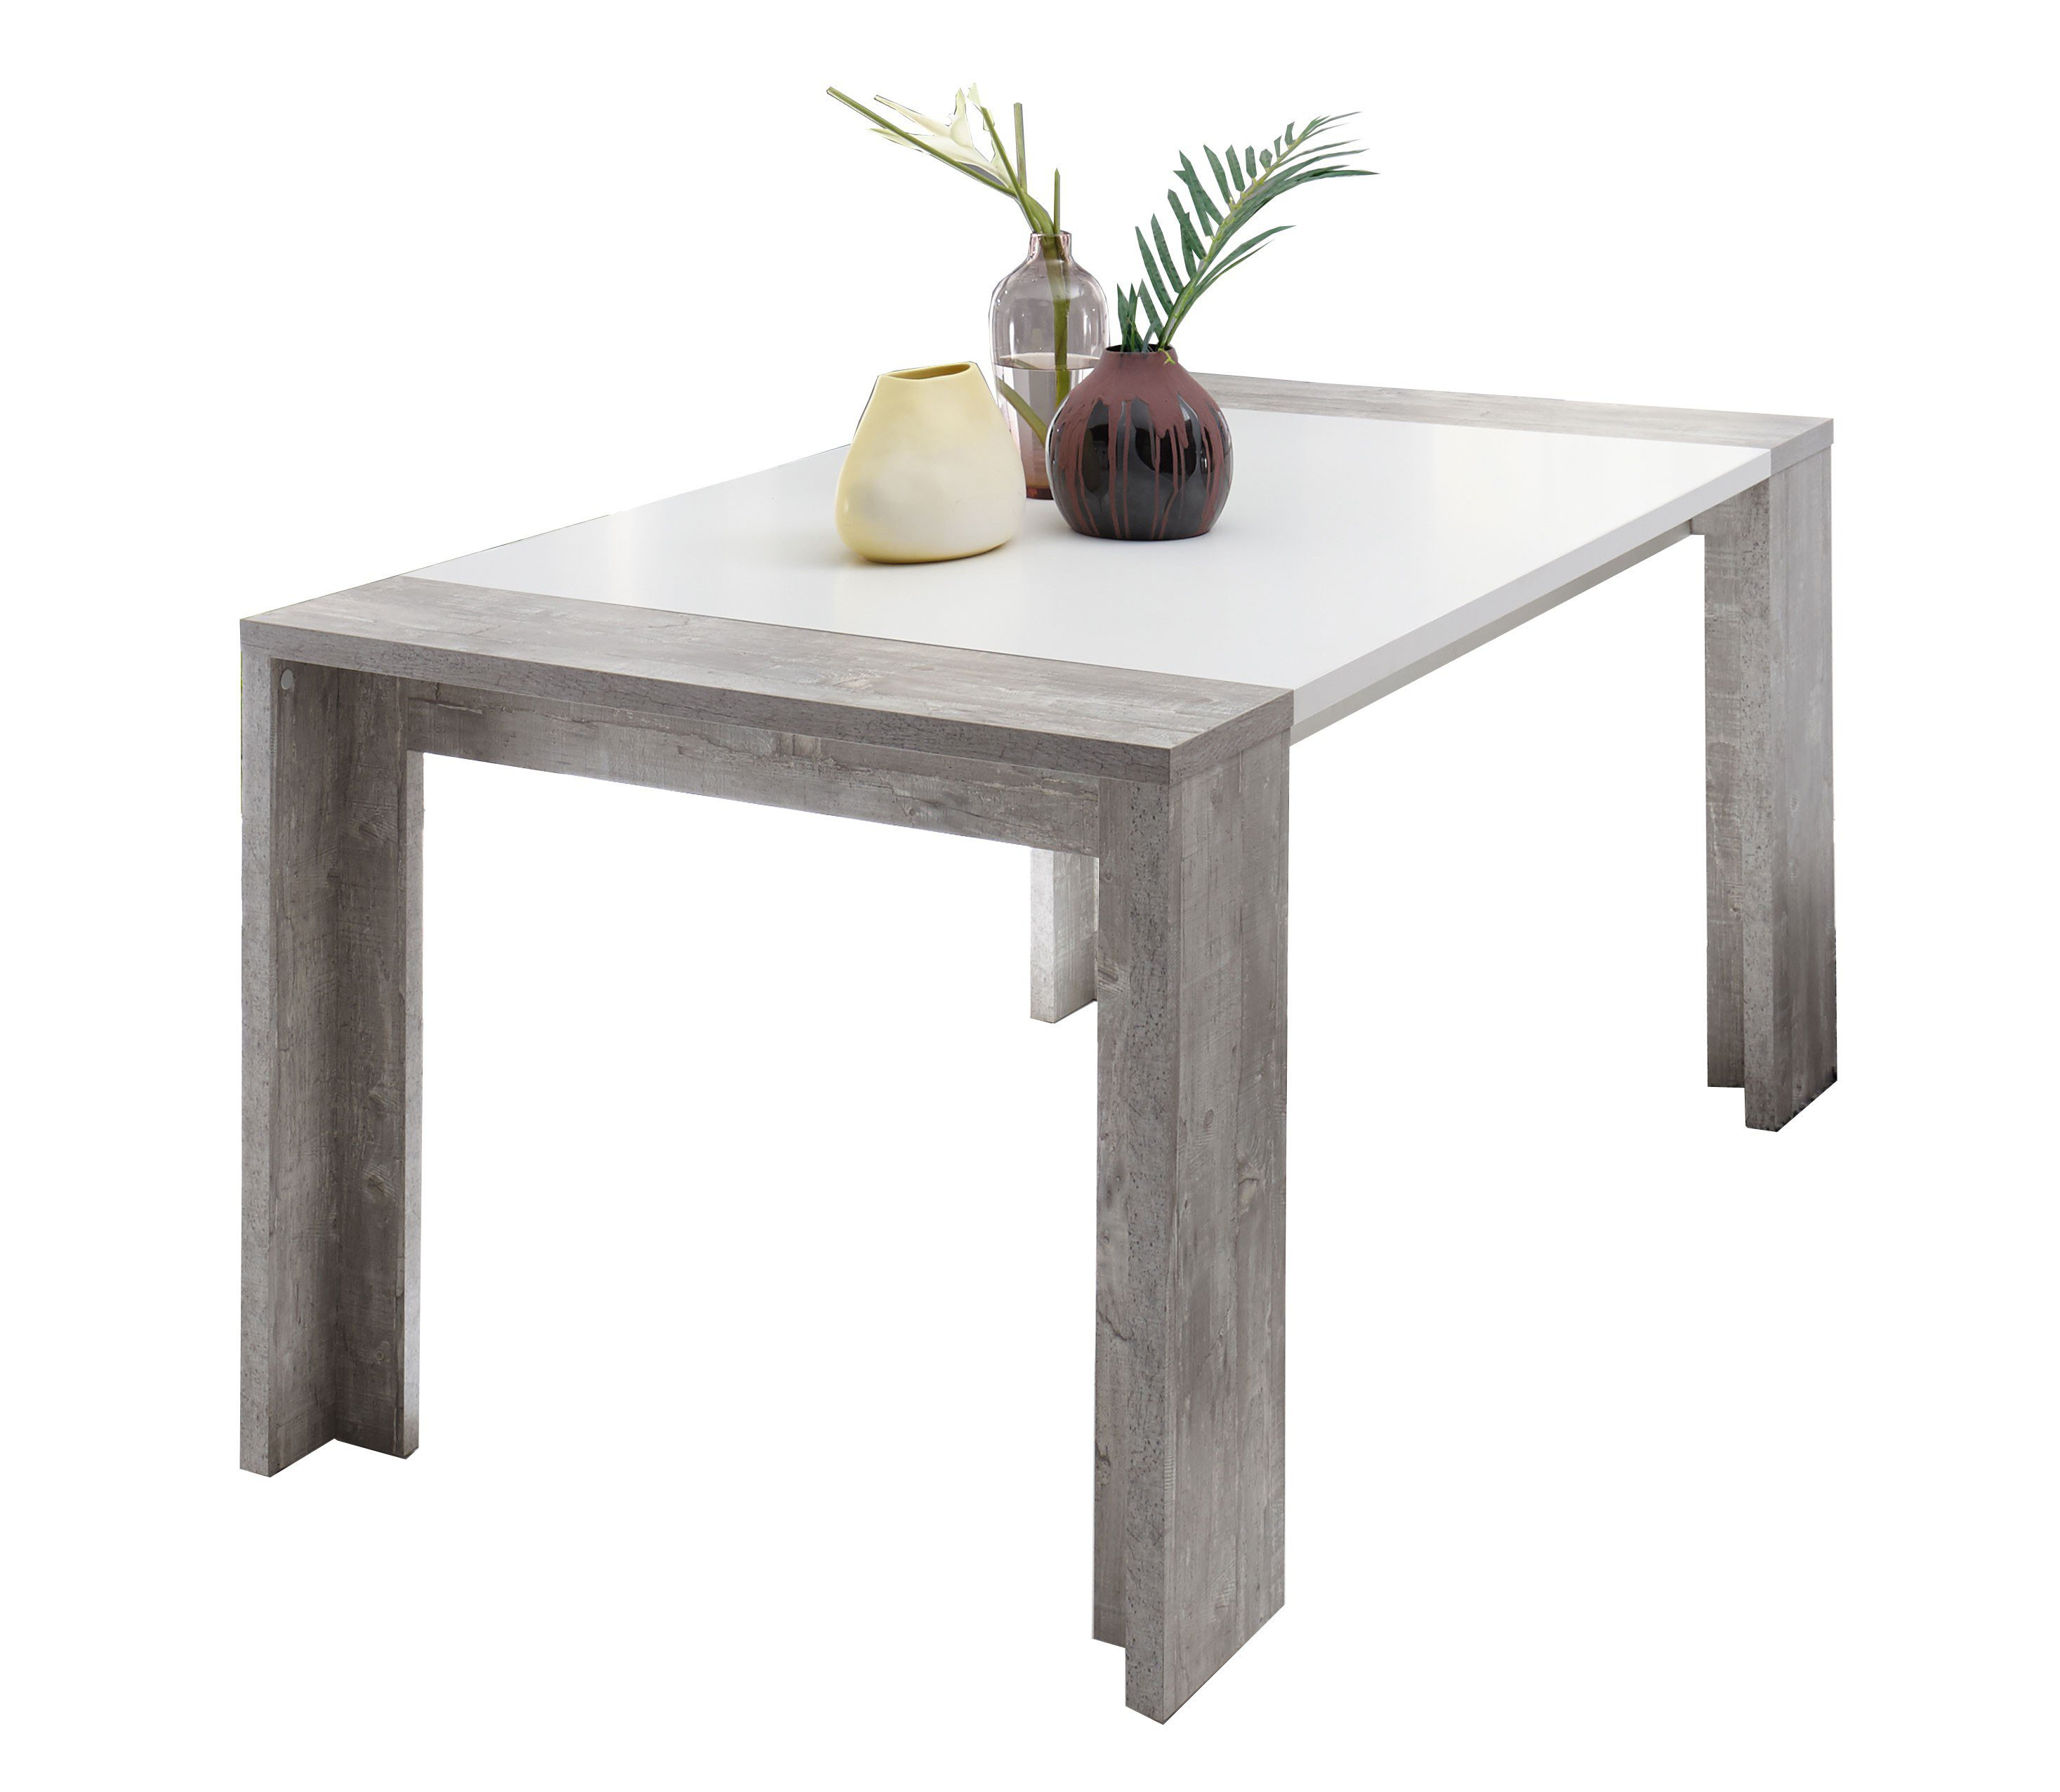 mäusbacher komfort 1/ hucknall esstisch beton/ weiß matt | möbel, Esszimmer dekoo